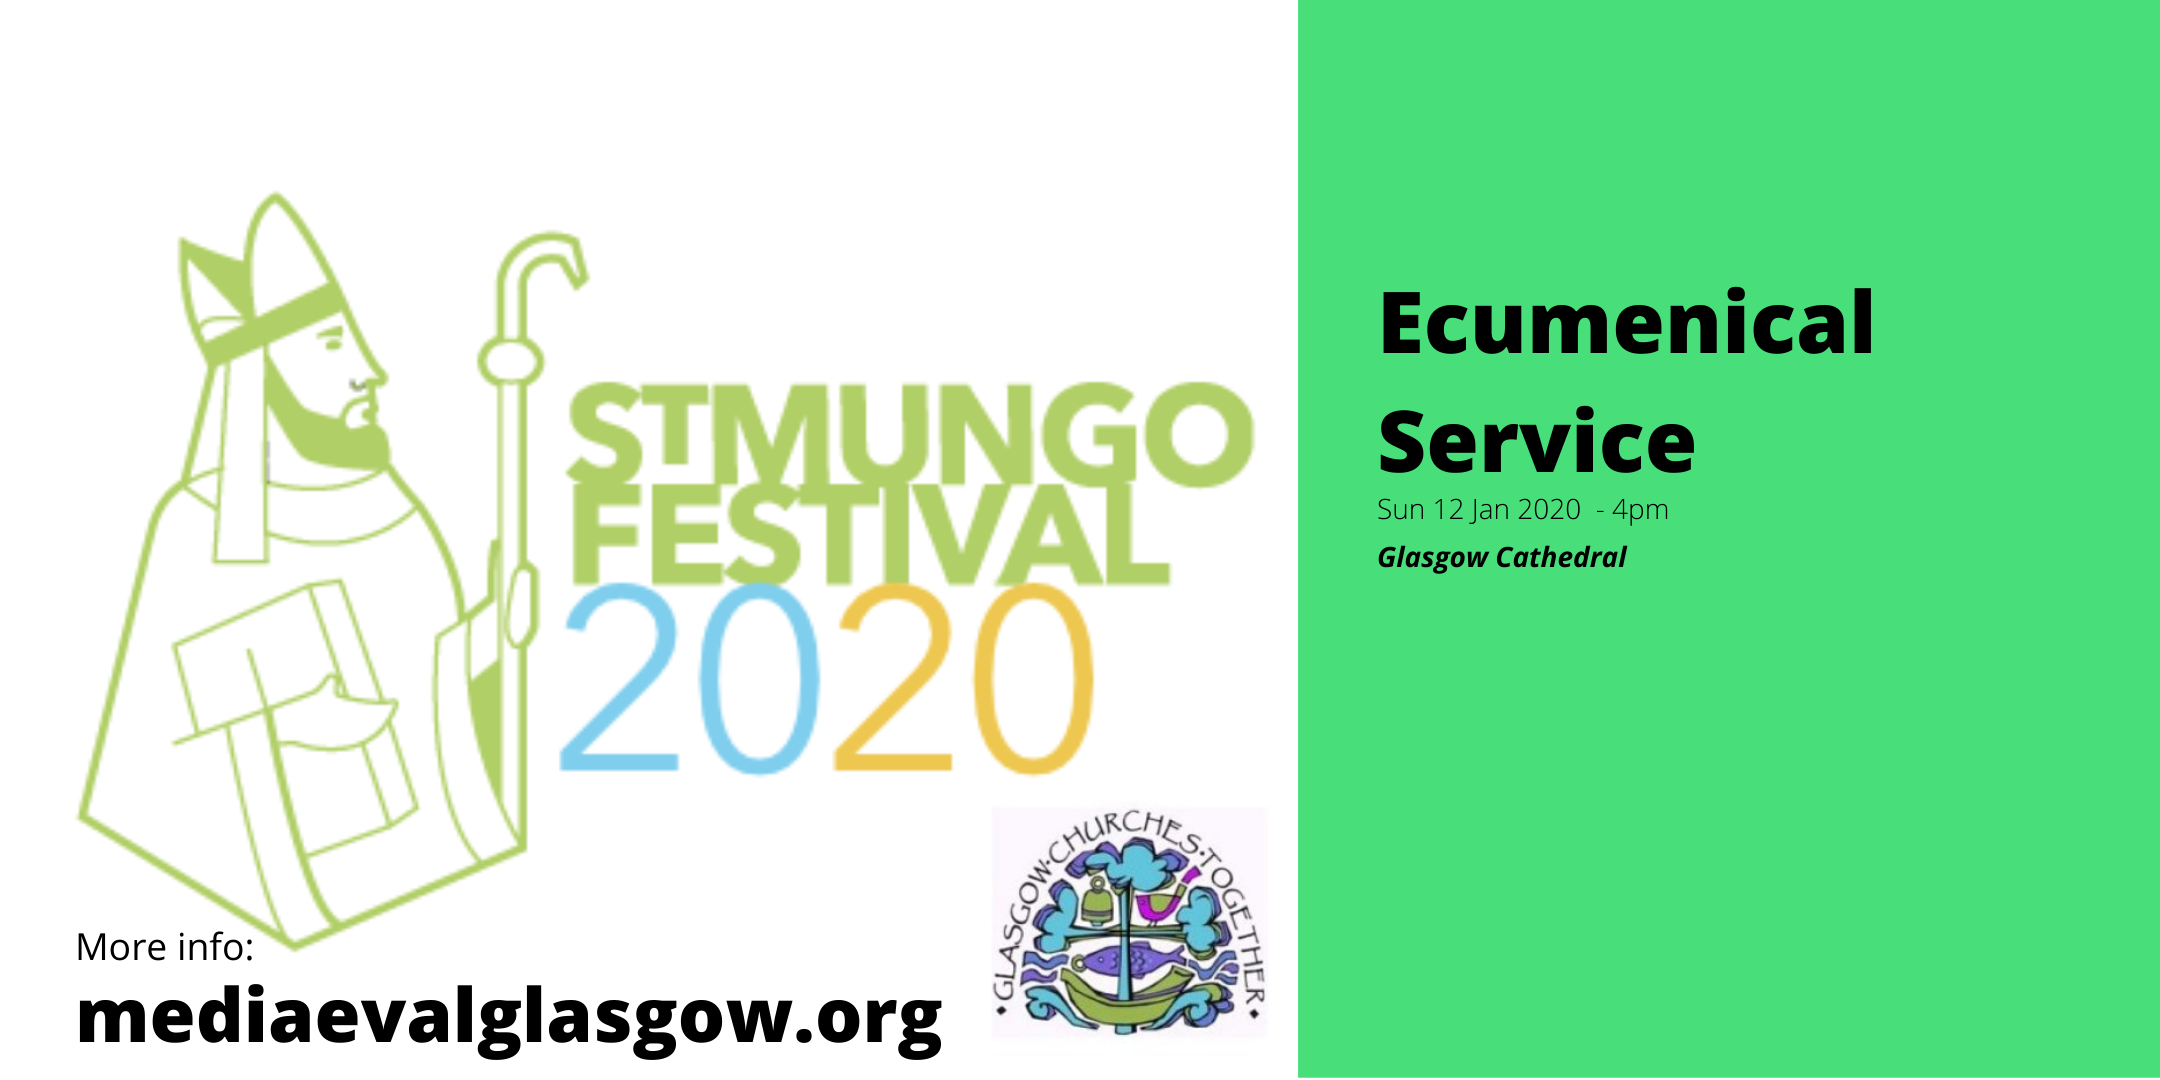 St Mungo 2020 - St MUNGO Ecumenical Festival Service